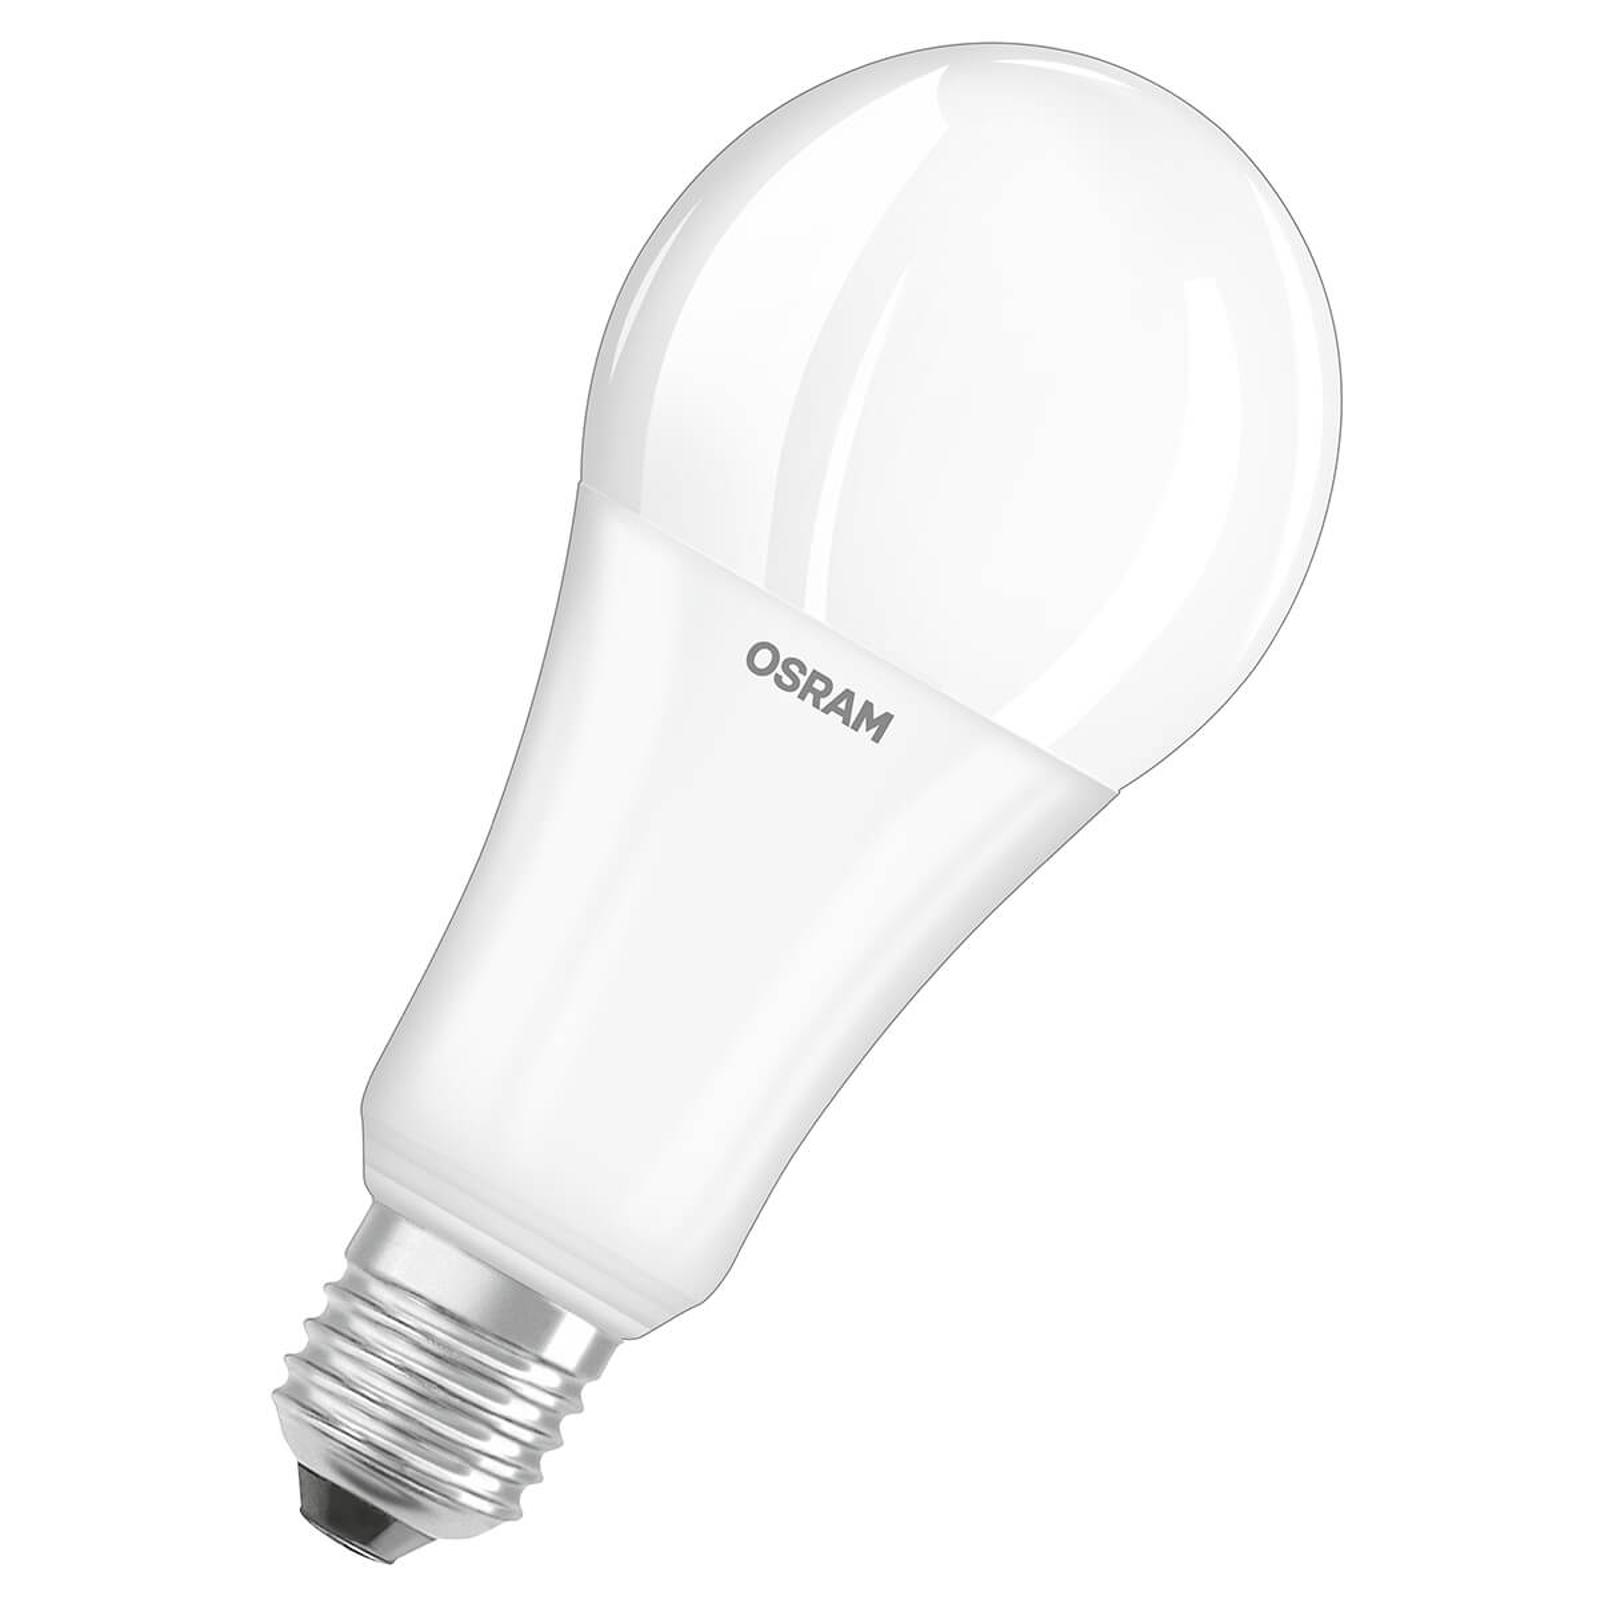 OSRAM LED-pære E27, 19W, 2700K, 2452 lm matt